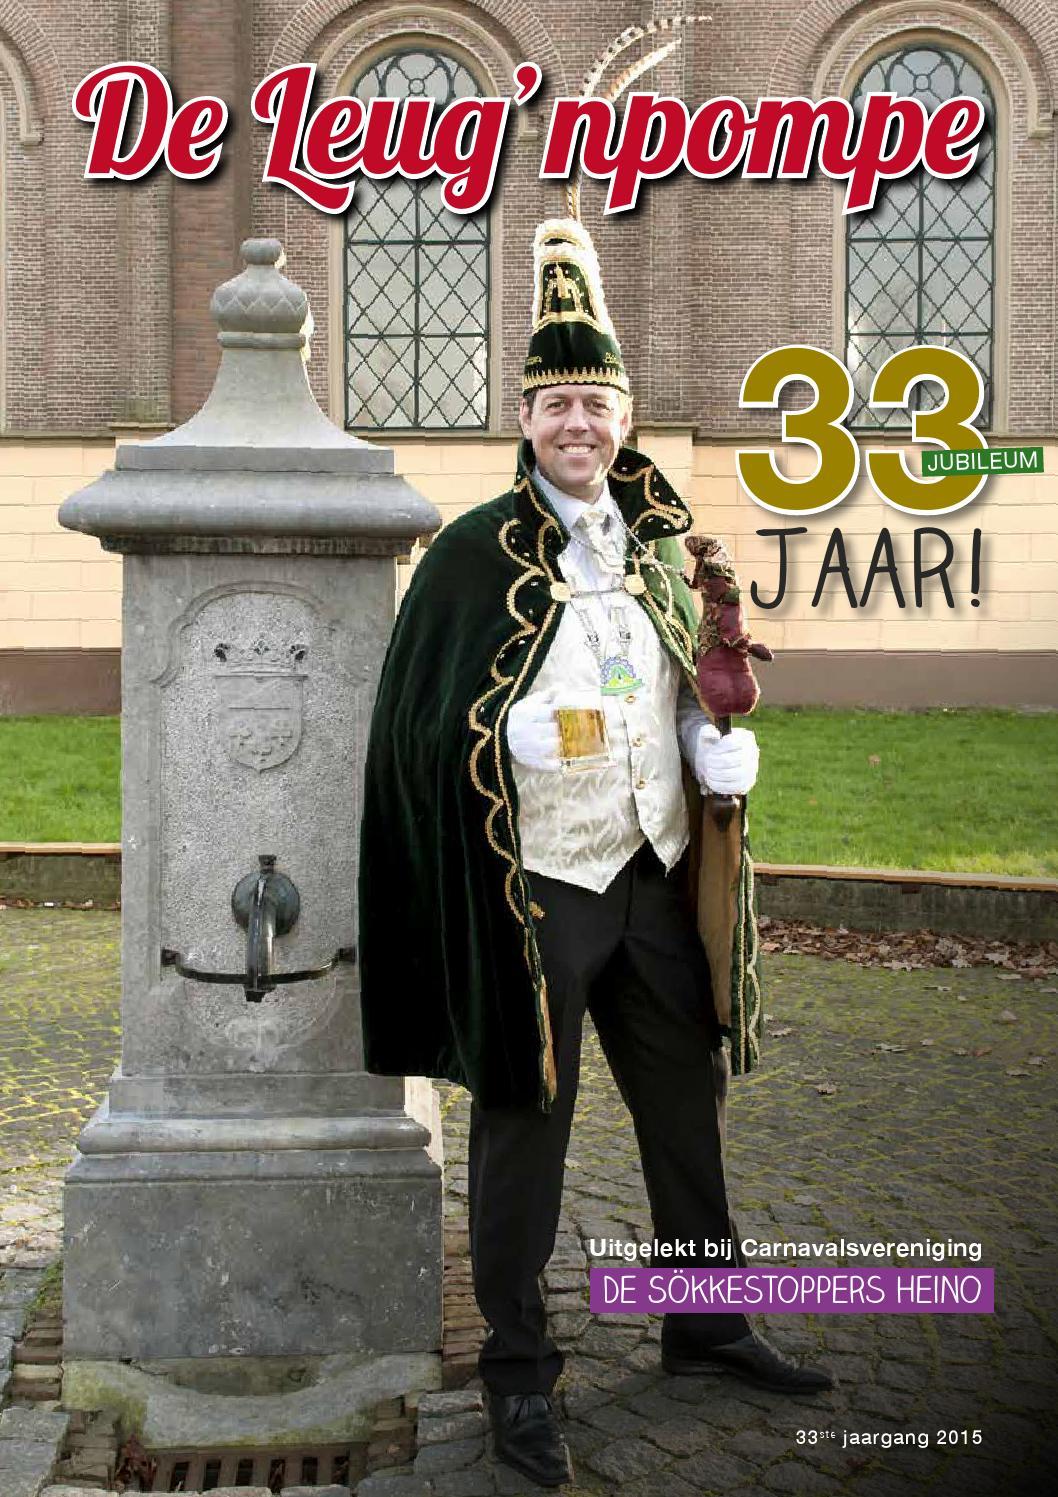 Leug'npompe 2013 by martijn jansman   issuu